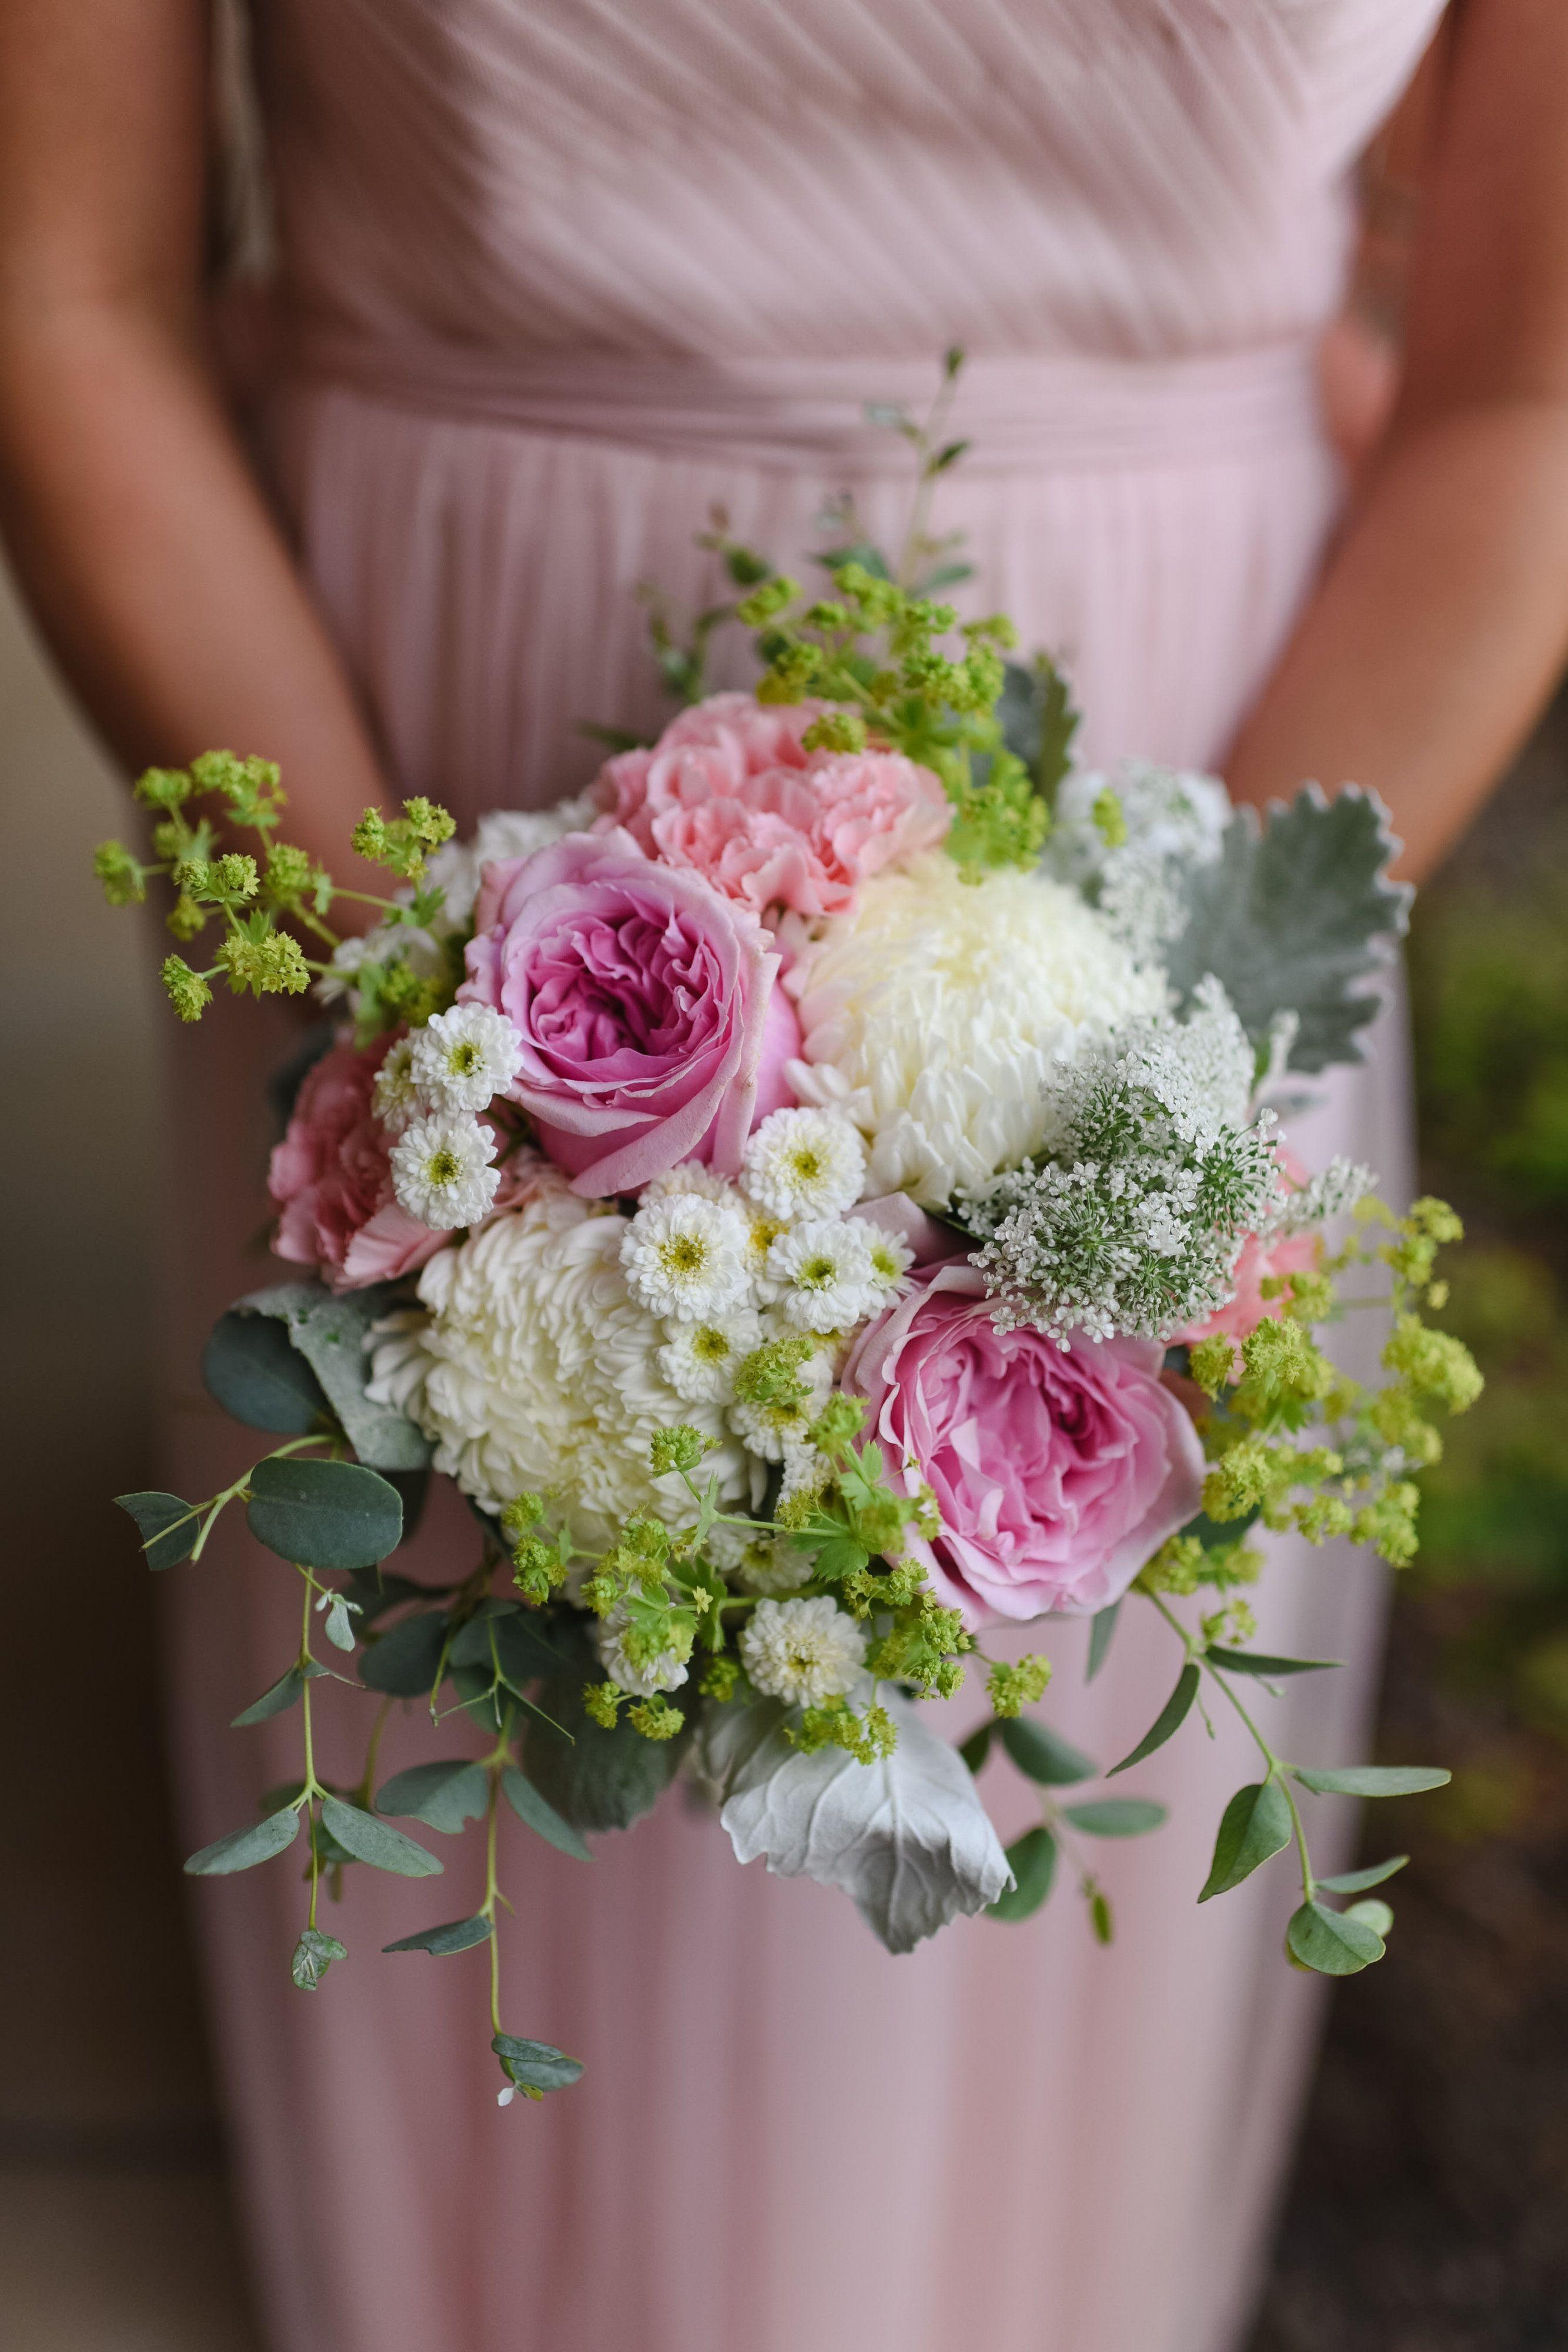 Pink and white bridesmaids bouquet designed by hilltop florist and pink and white bridesmaids bouquet designed by hilltop florist and greenhouse mankato mn izmirmasajfo